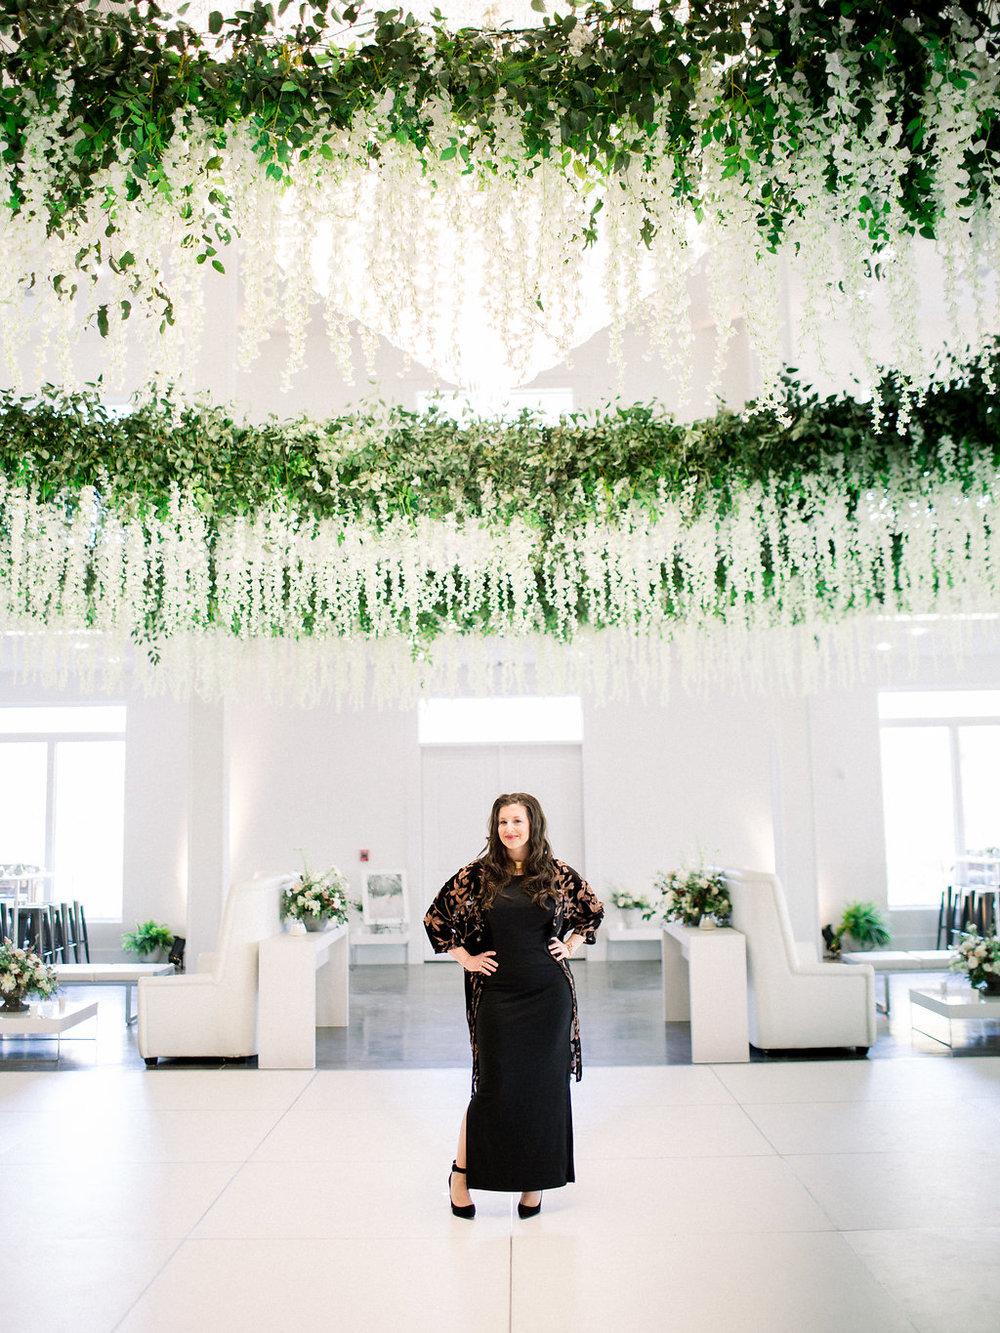 Jessica-Zimmerman-Events-Top-Wedding-Planner-Floral-Design-Expert-Speaker.jpg